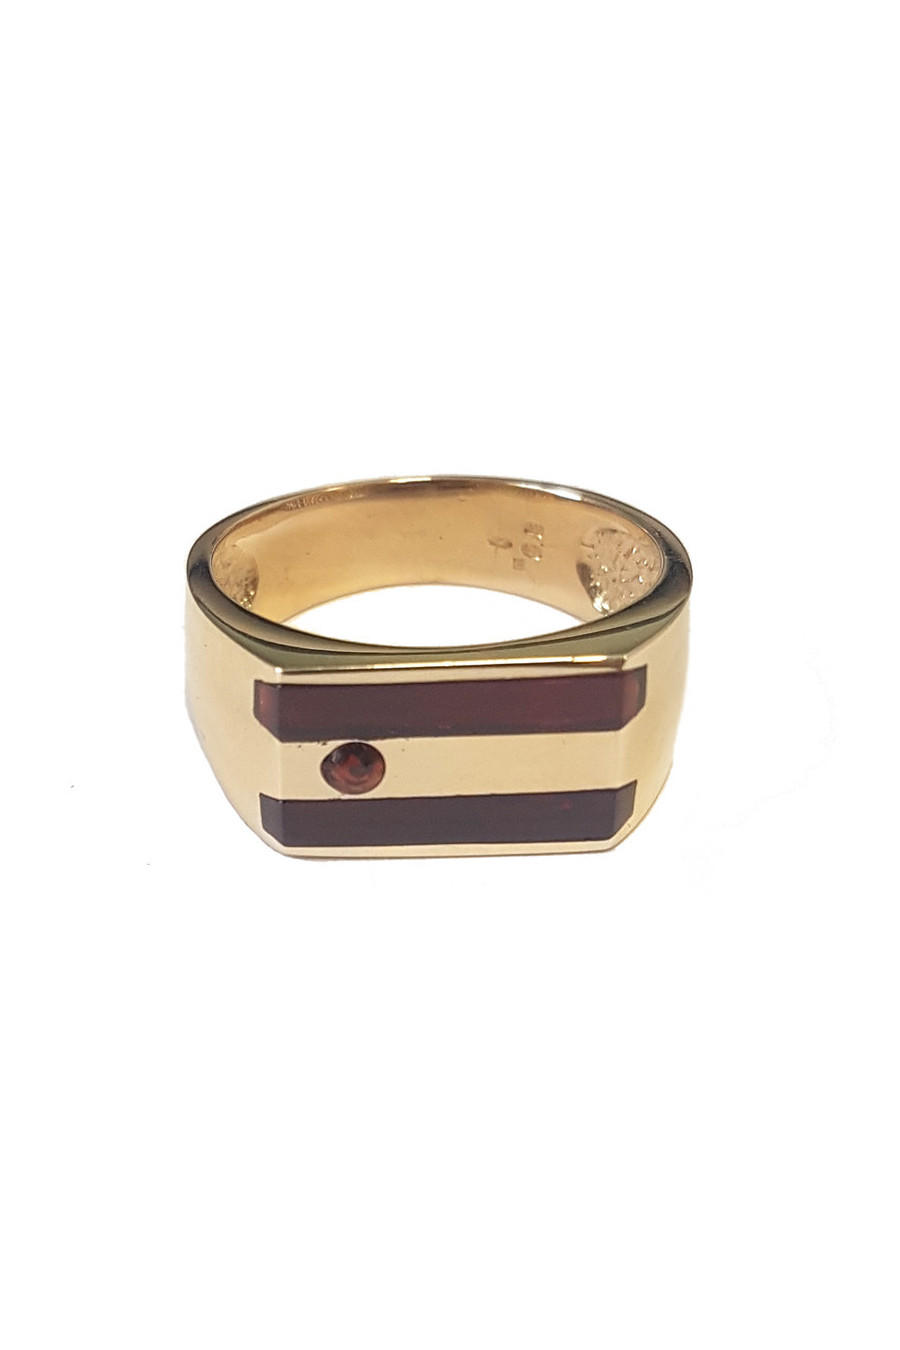 Gold men's ring with garnet